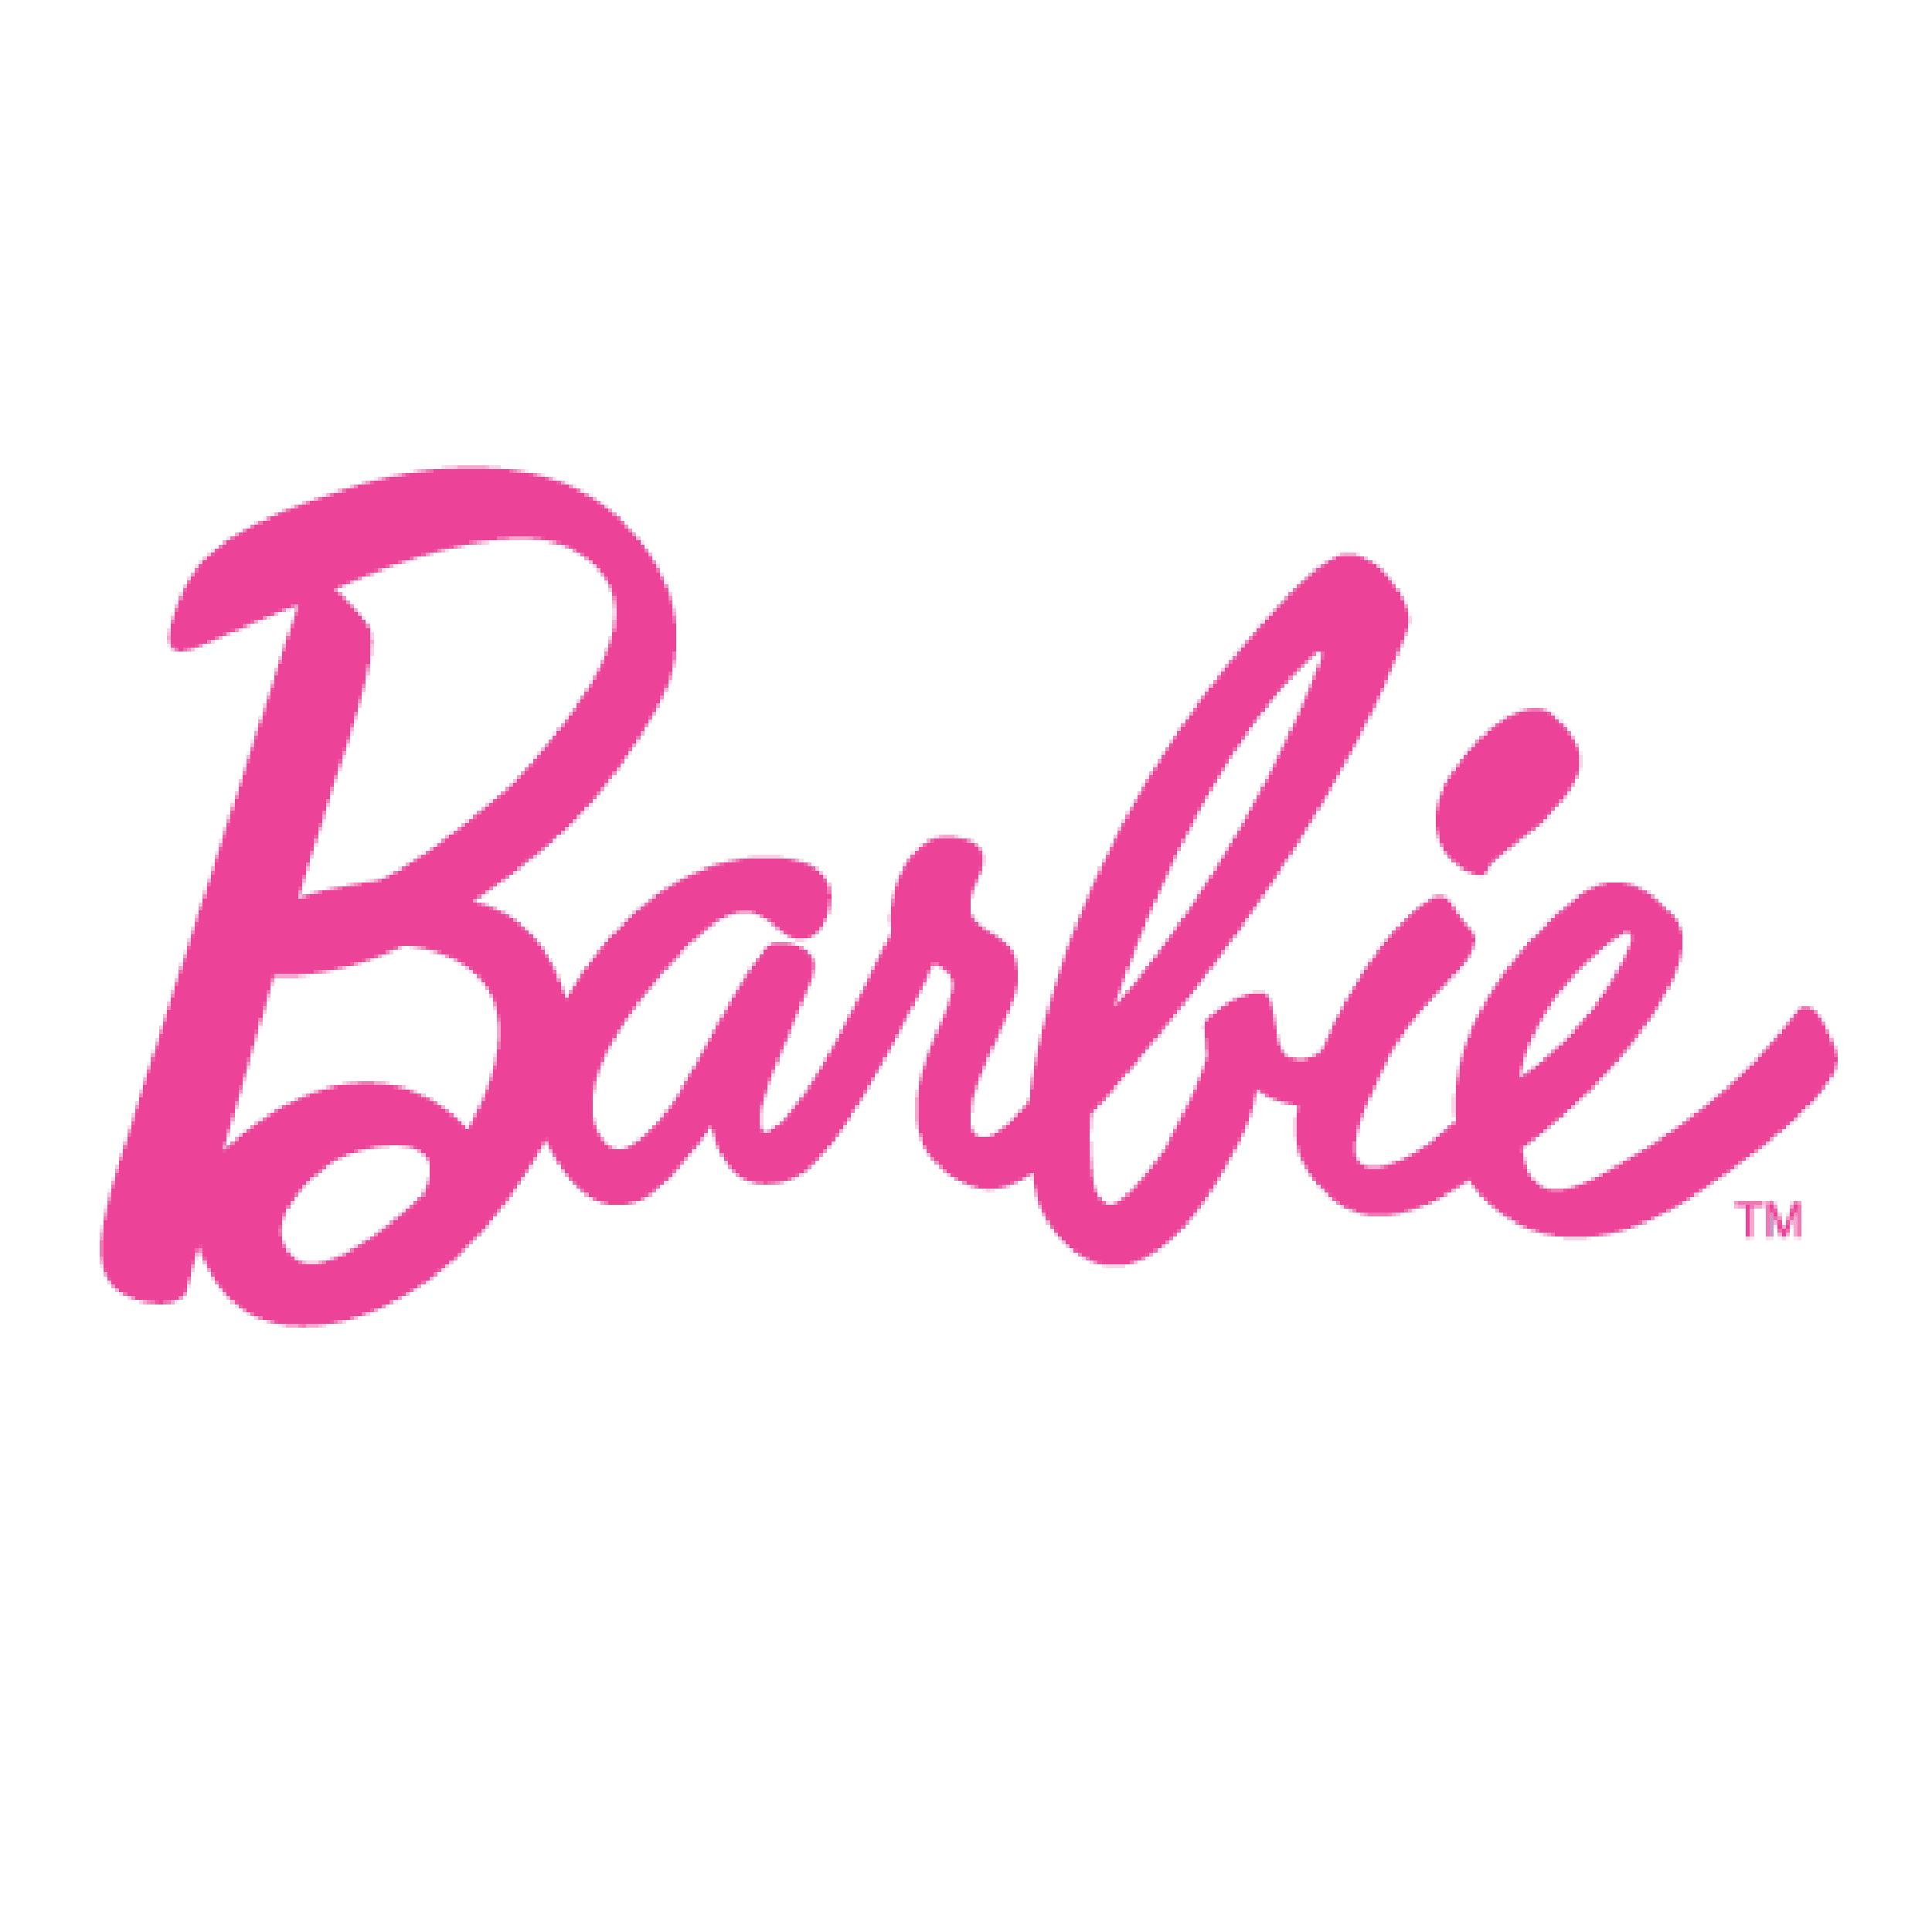 TBT_Barbielogo.png